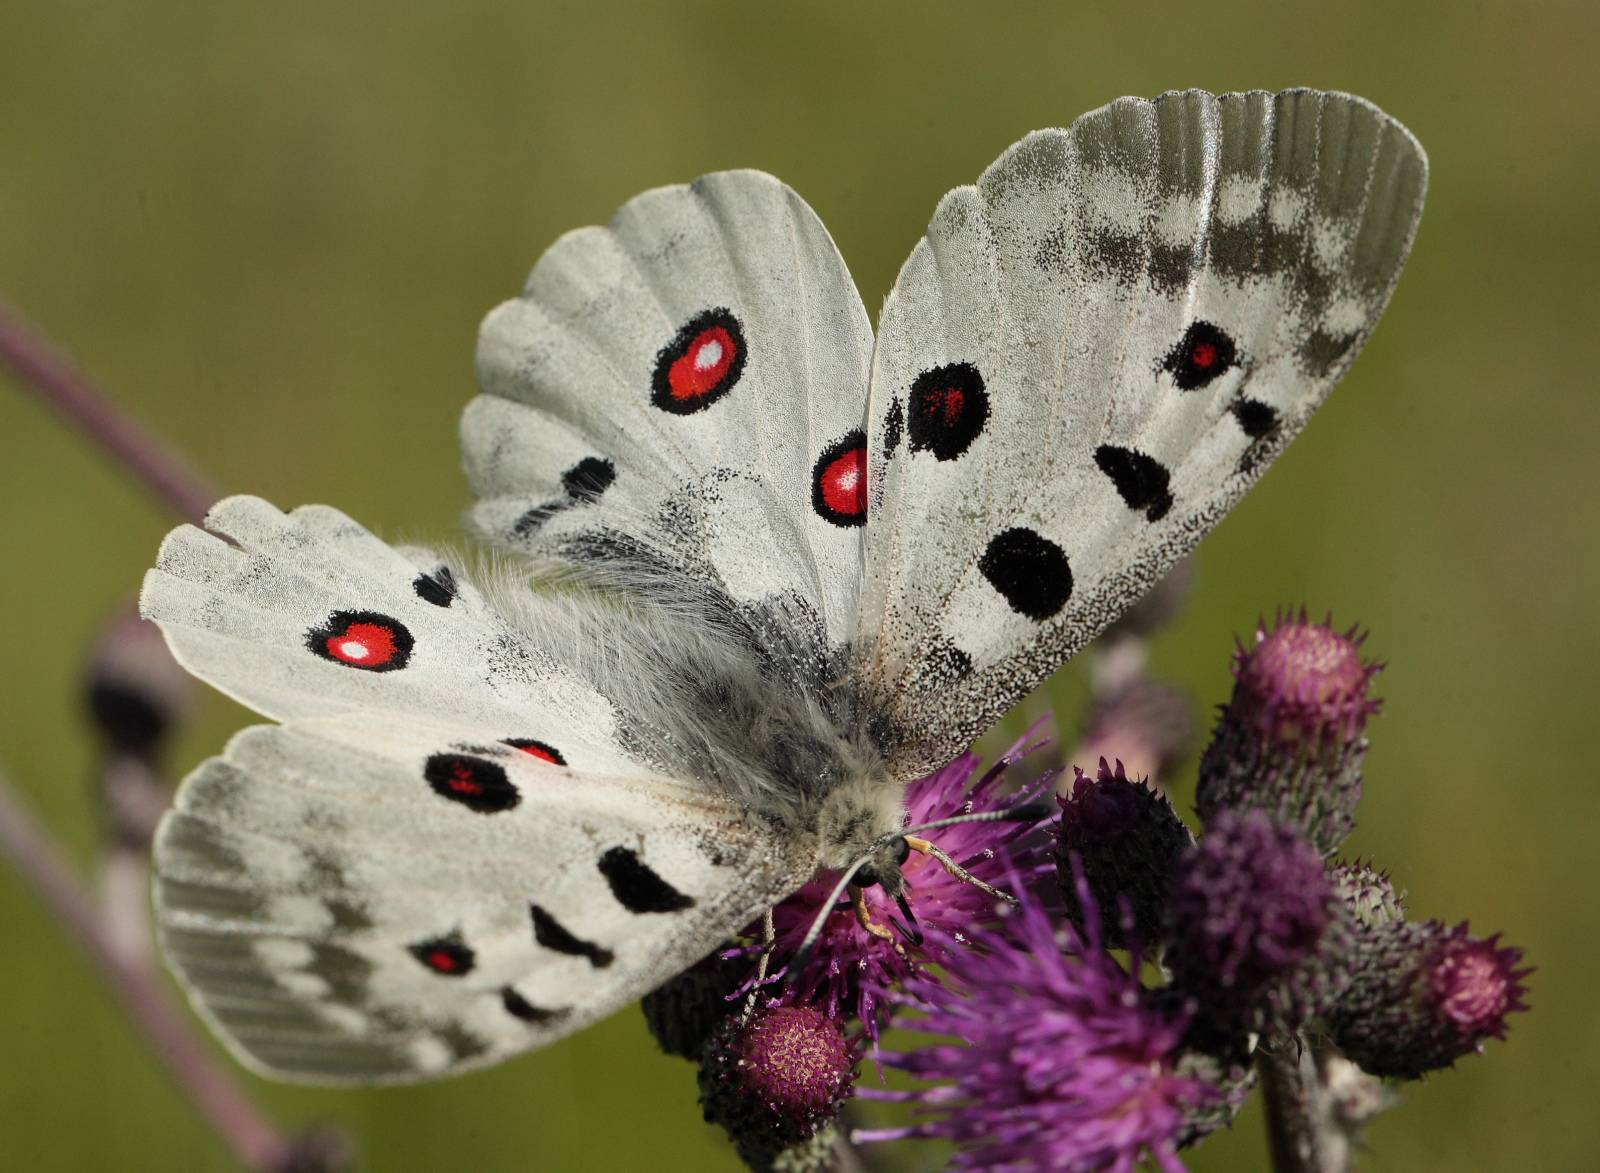 Подробное описание (характеристика и фото) бабочки аполлона